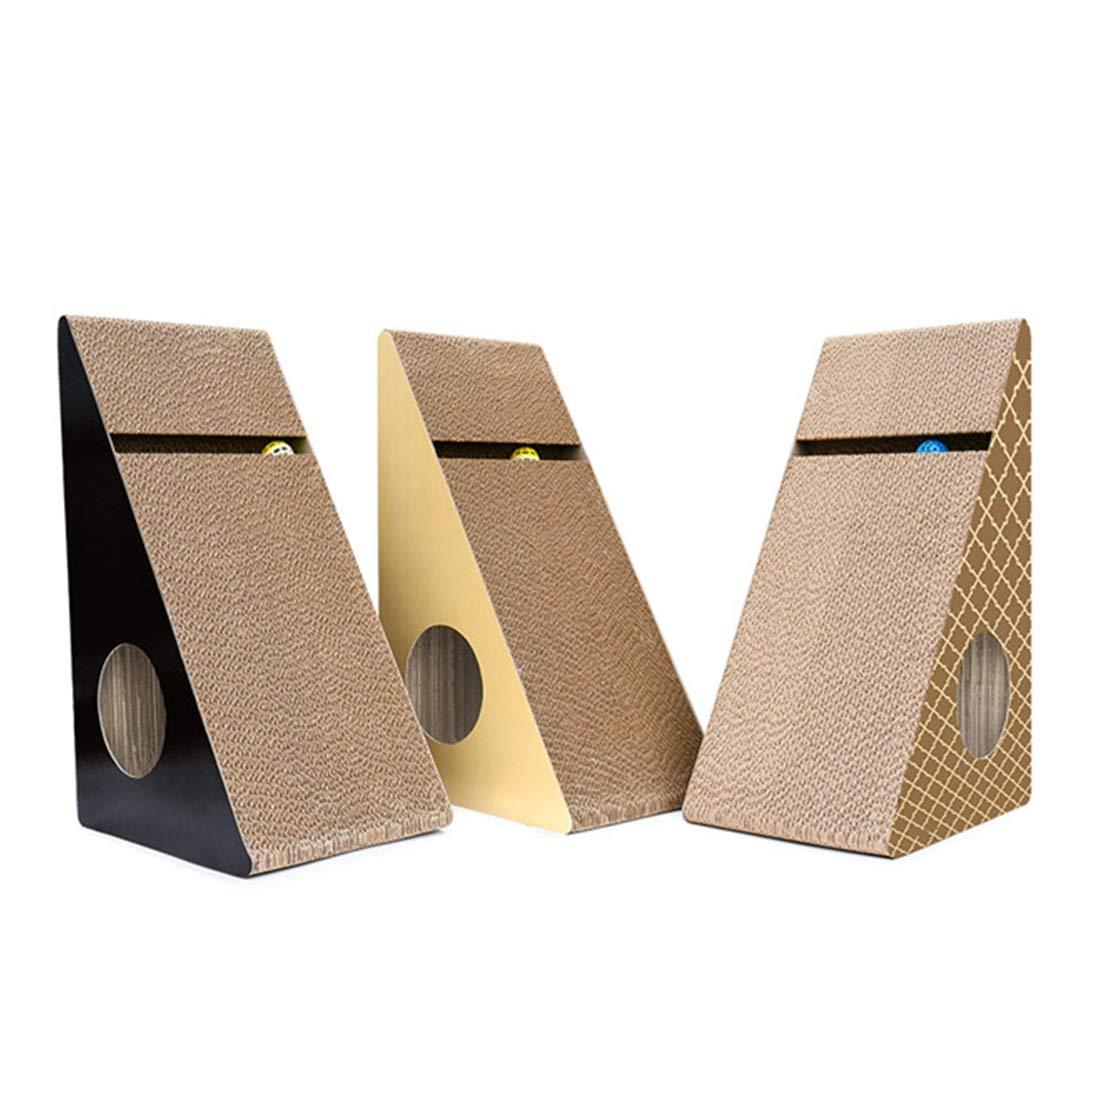 Pattern 60X36.5X27.5CM Pattern 60X36.5X27.5CM Hyue Corrugated Paper Against Wall Bells trilateral cat Scratch Board cat Toys cat pet Supplies cat Litter (color   Pattern, Size   60X36.5X27.5CM)